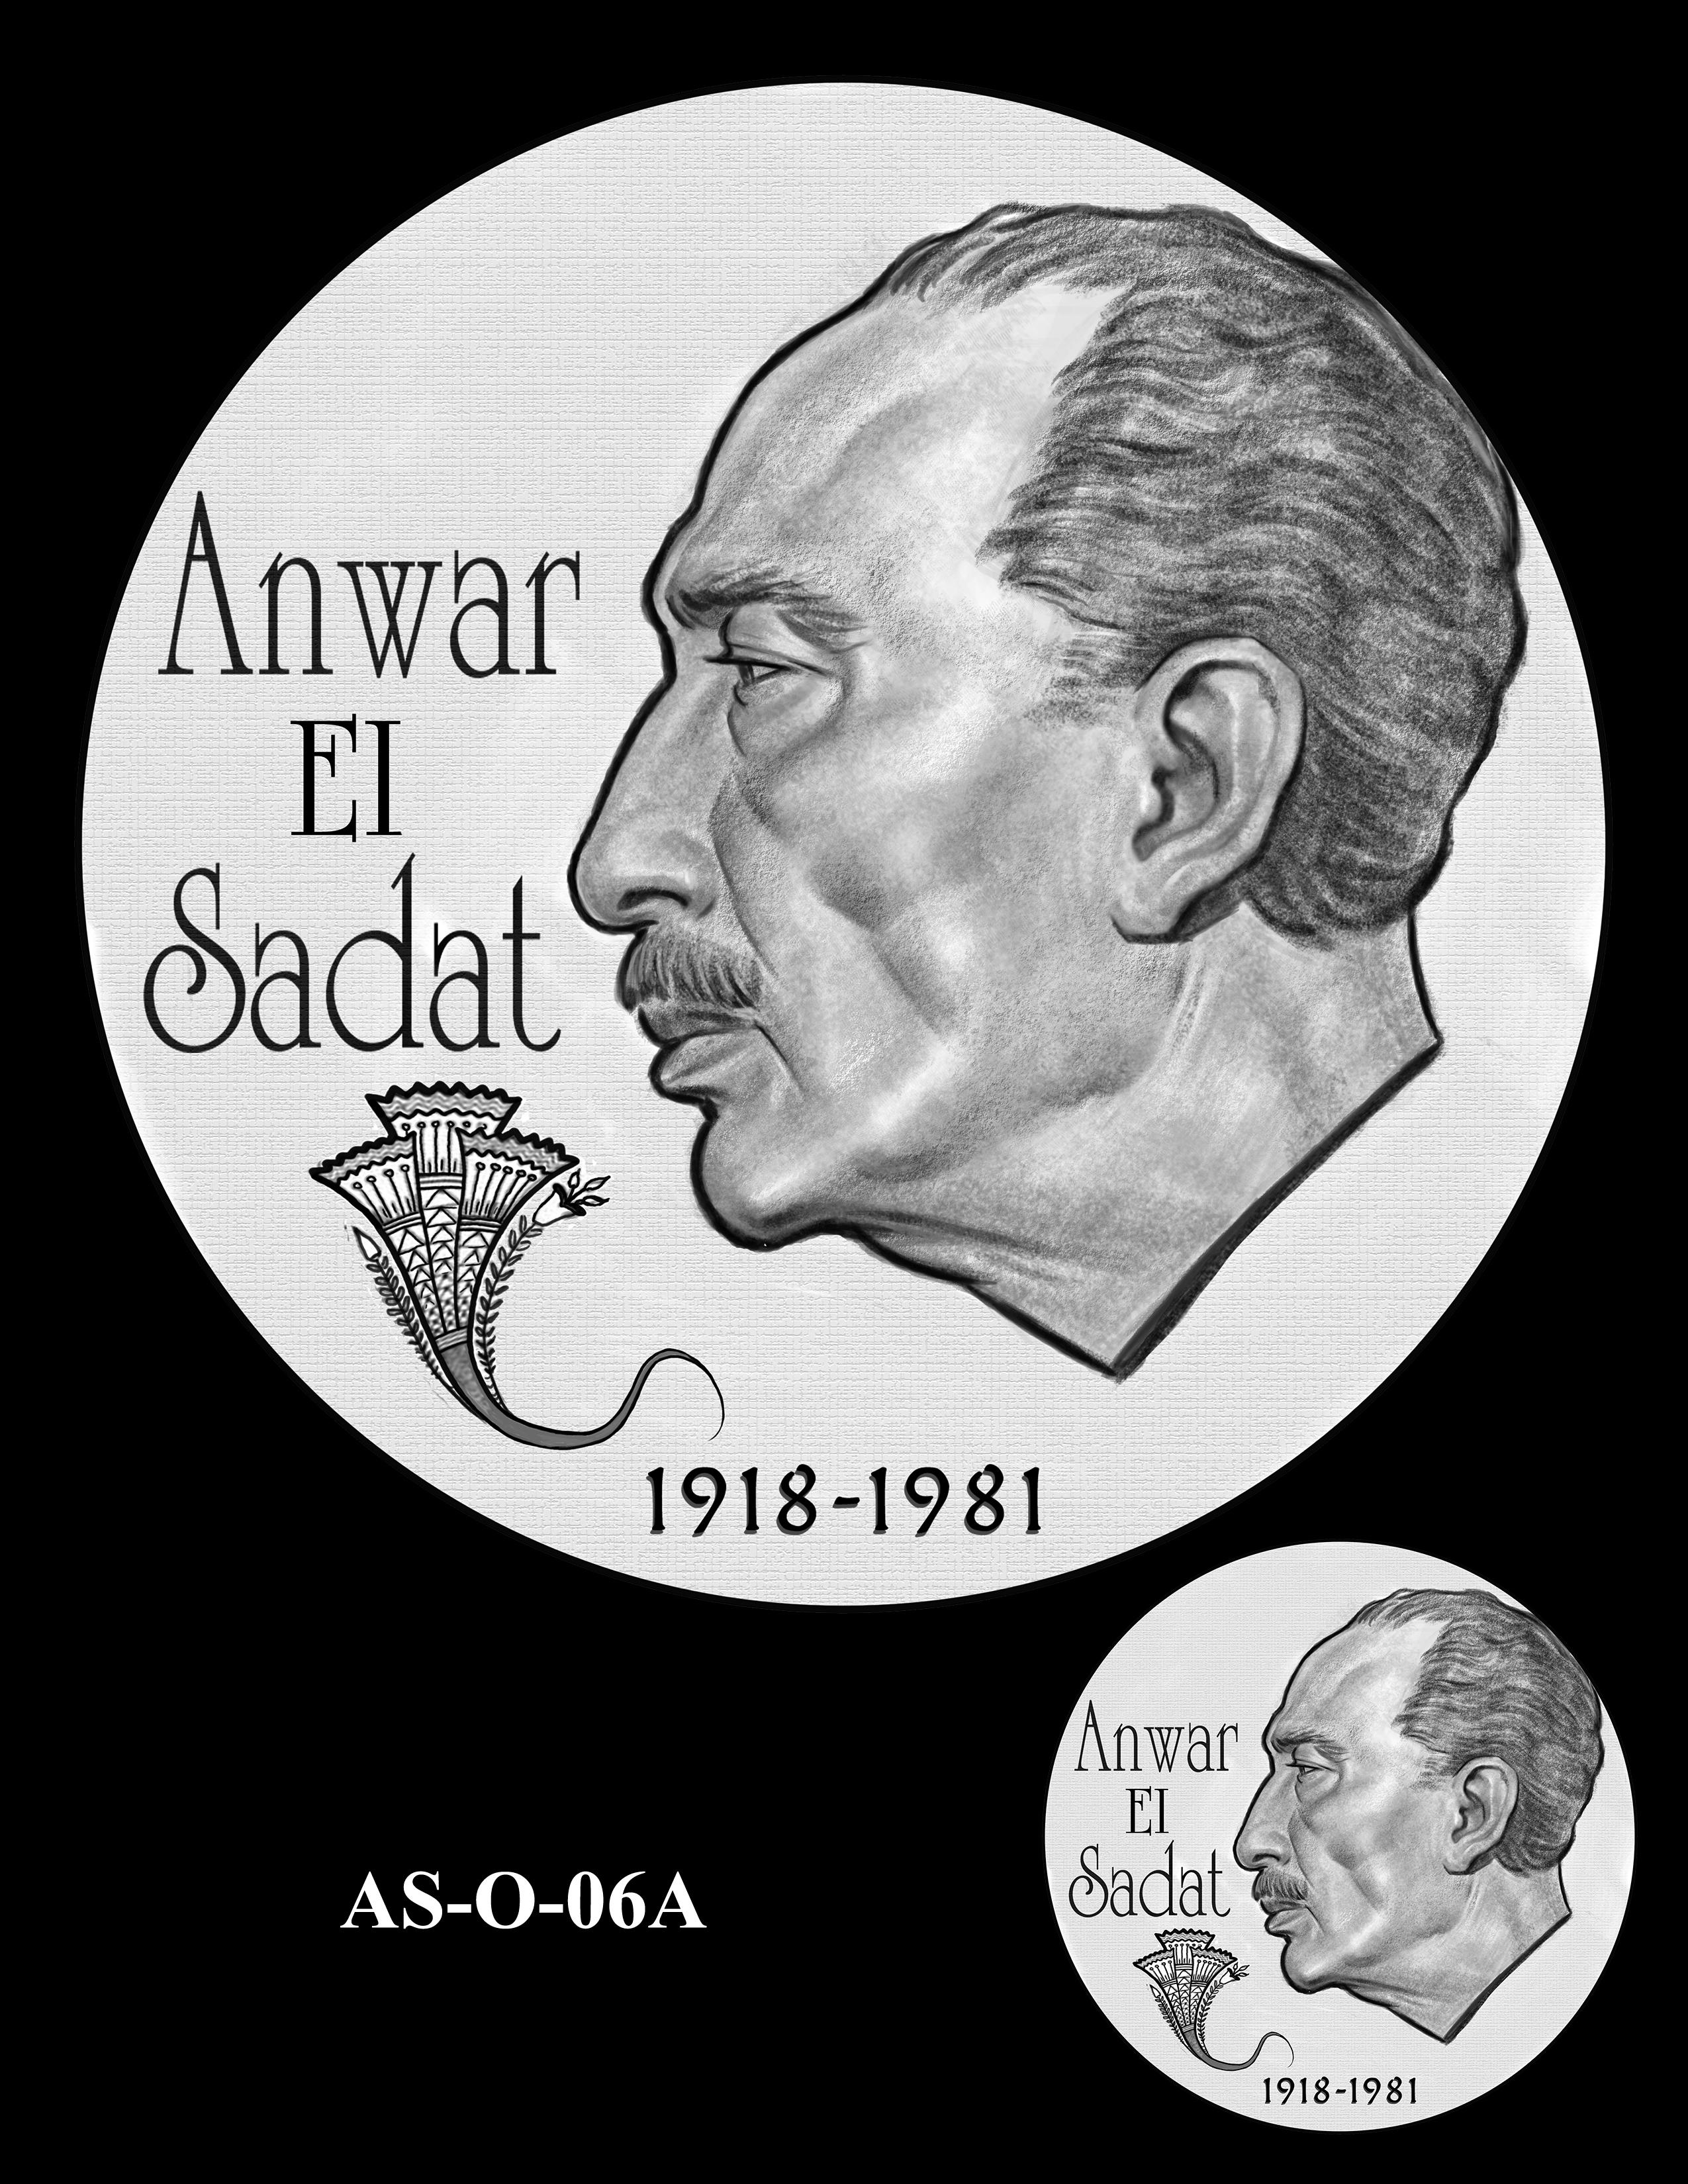 AS-O-06A -- Anwar El Sadat CGM Obverse